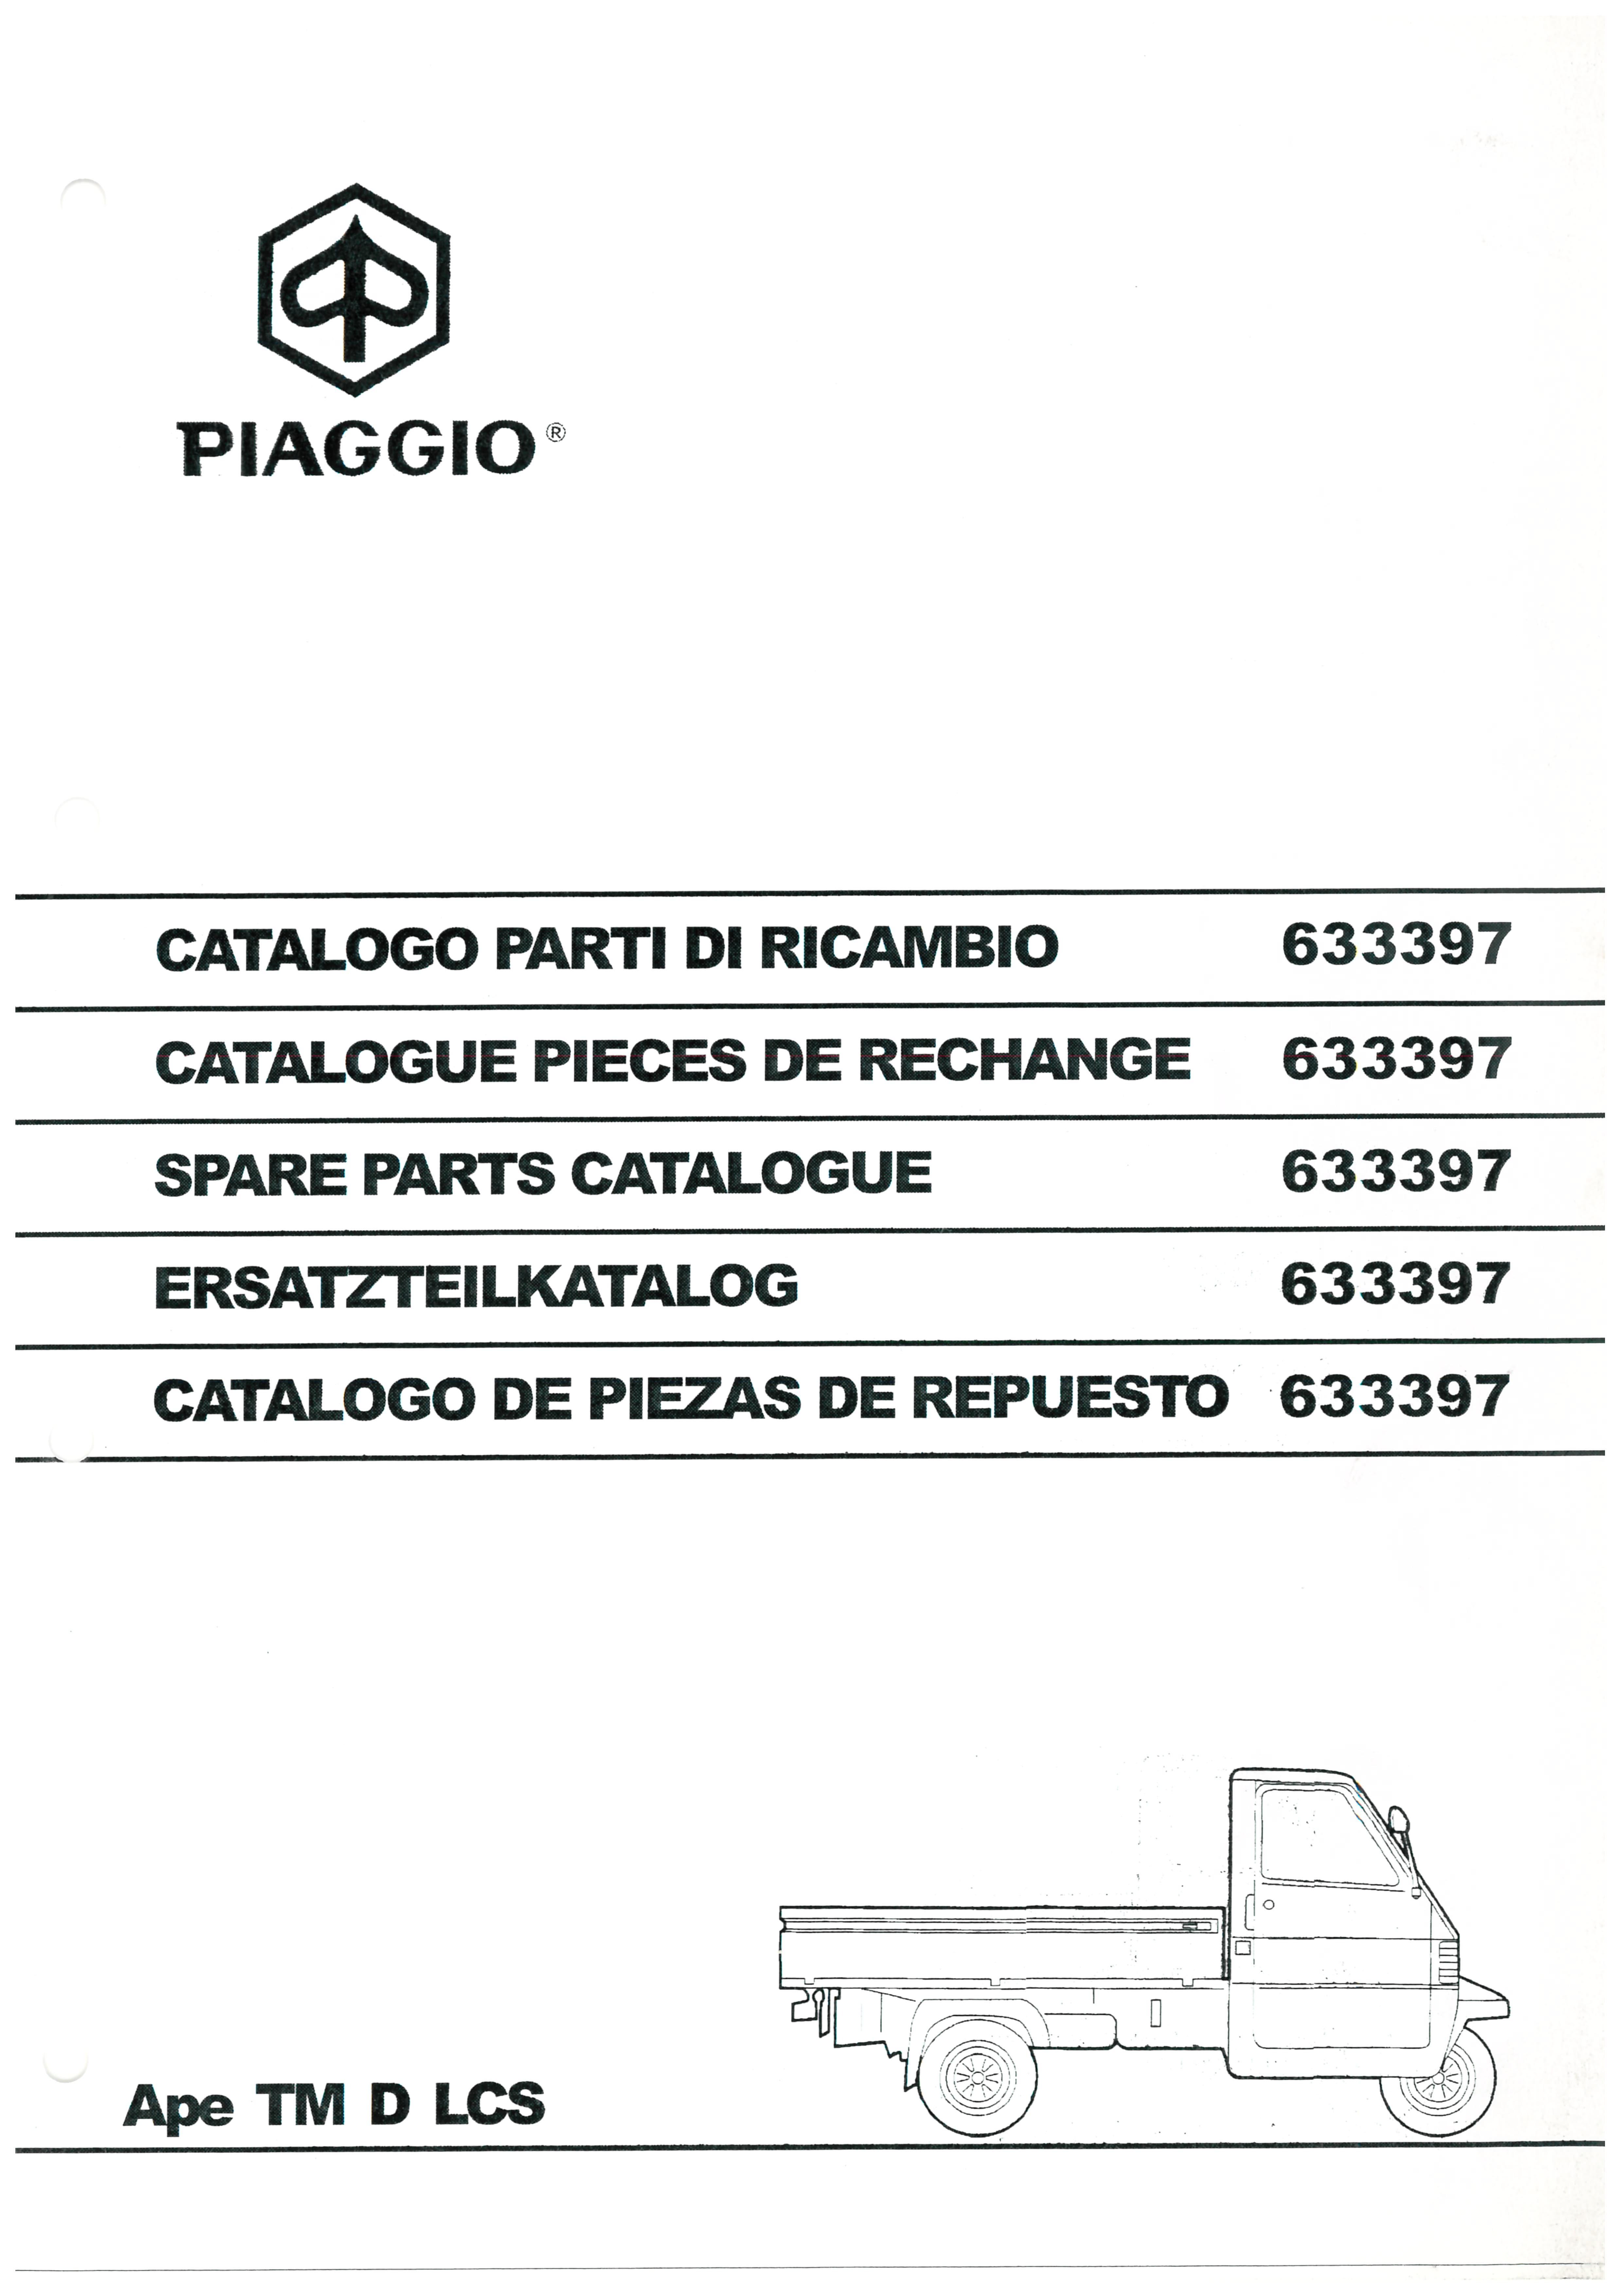 catalogue of spare parts piaggio ape tm d lcs mod zapt vespadoc rh vespadoc com piaggio ape parts list BMW Isetta